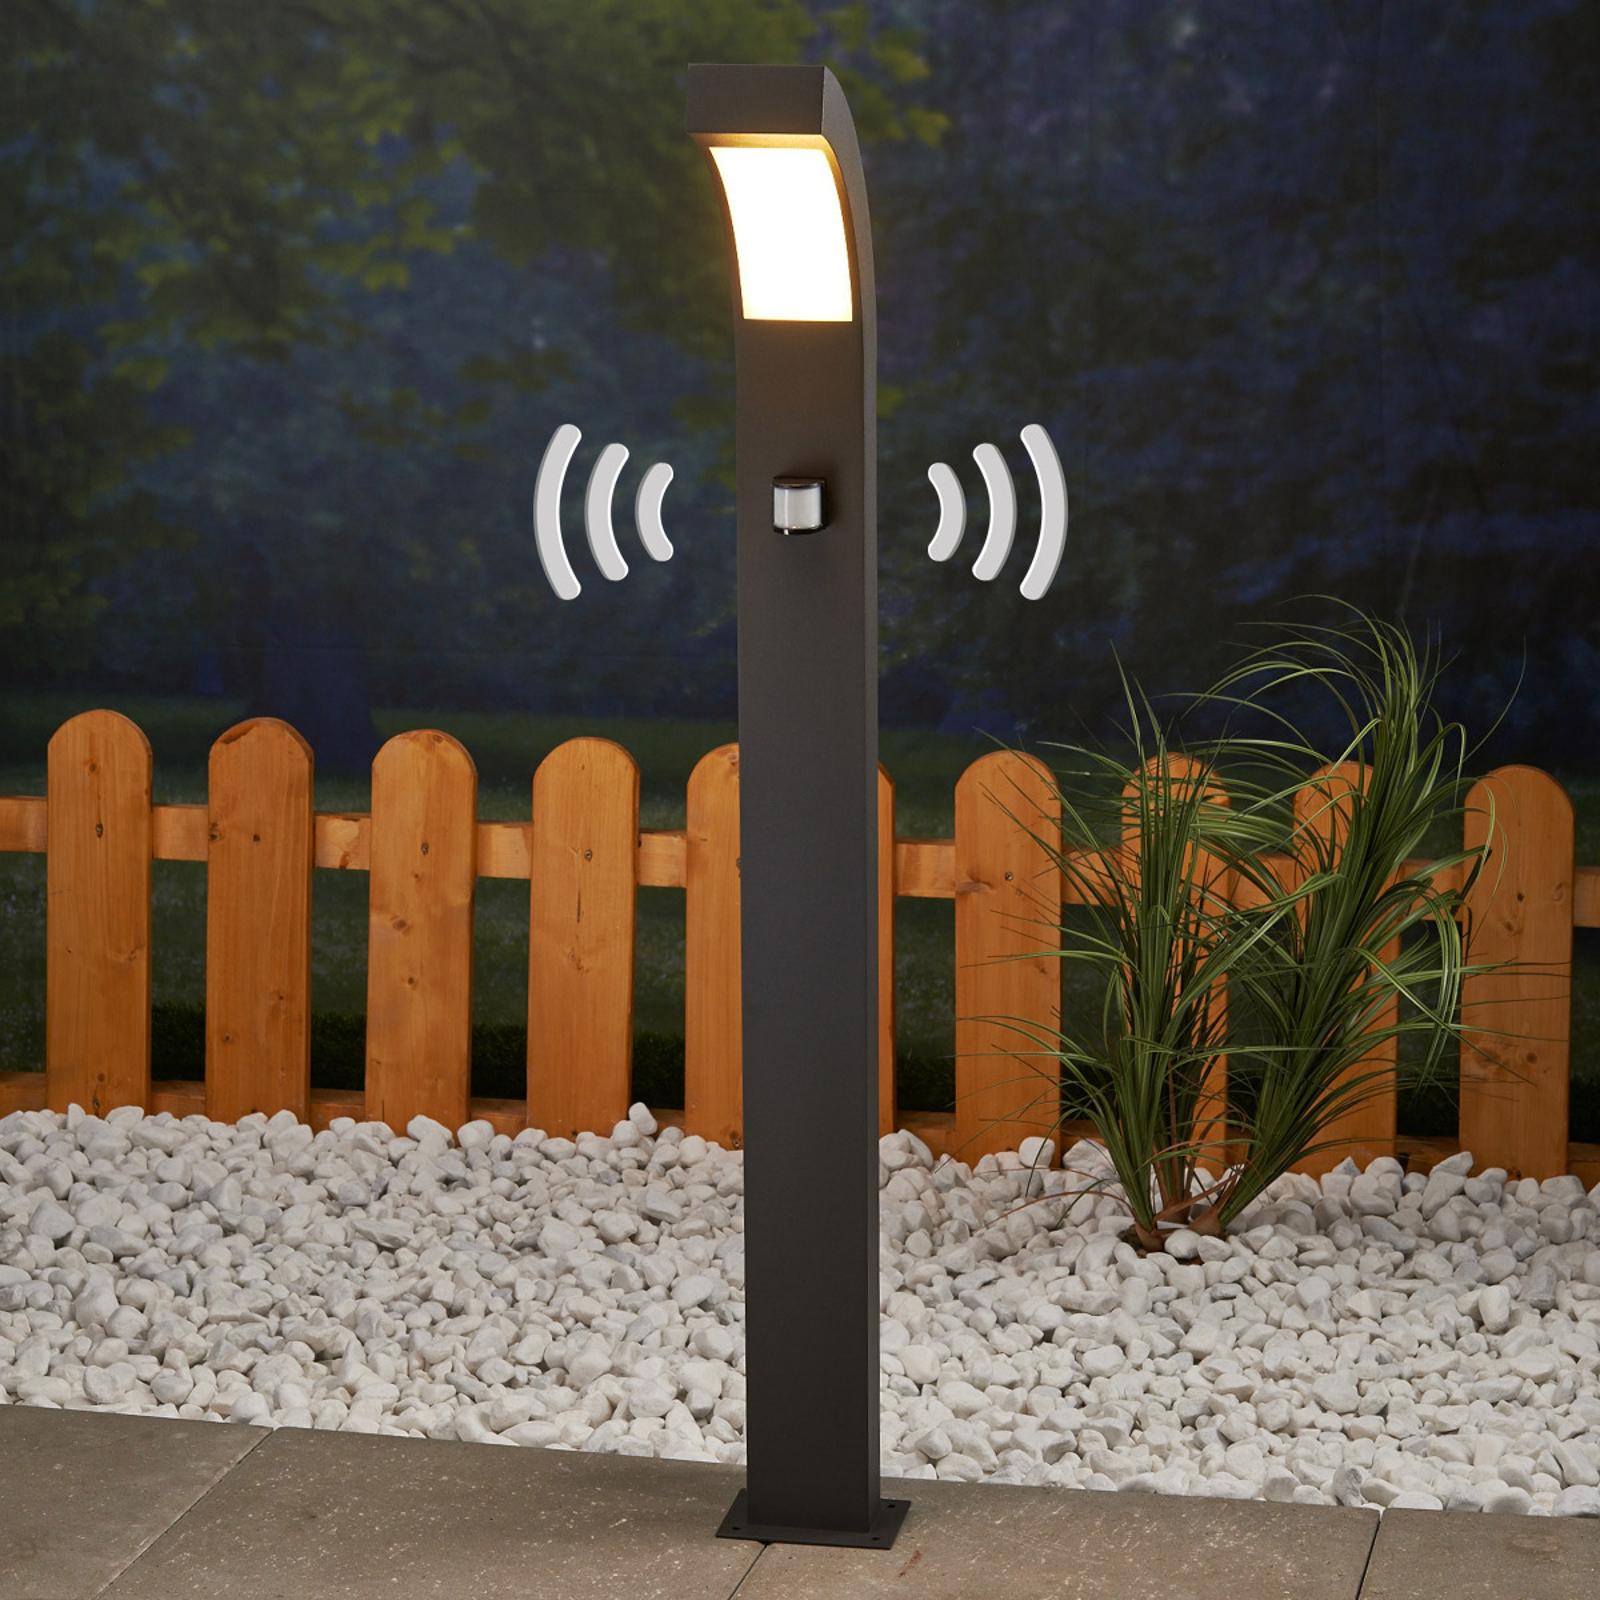 BalizaLEDLennik con sensor de movimiento